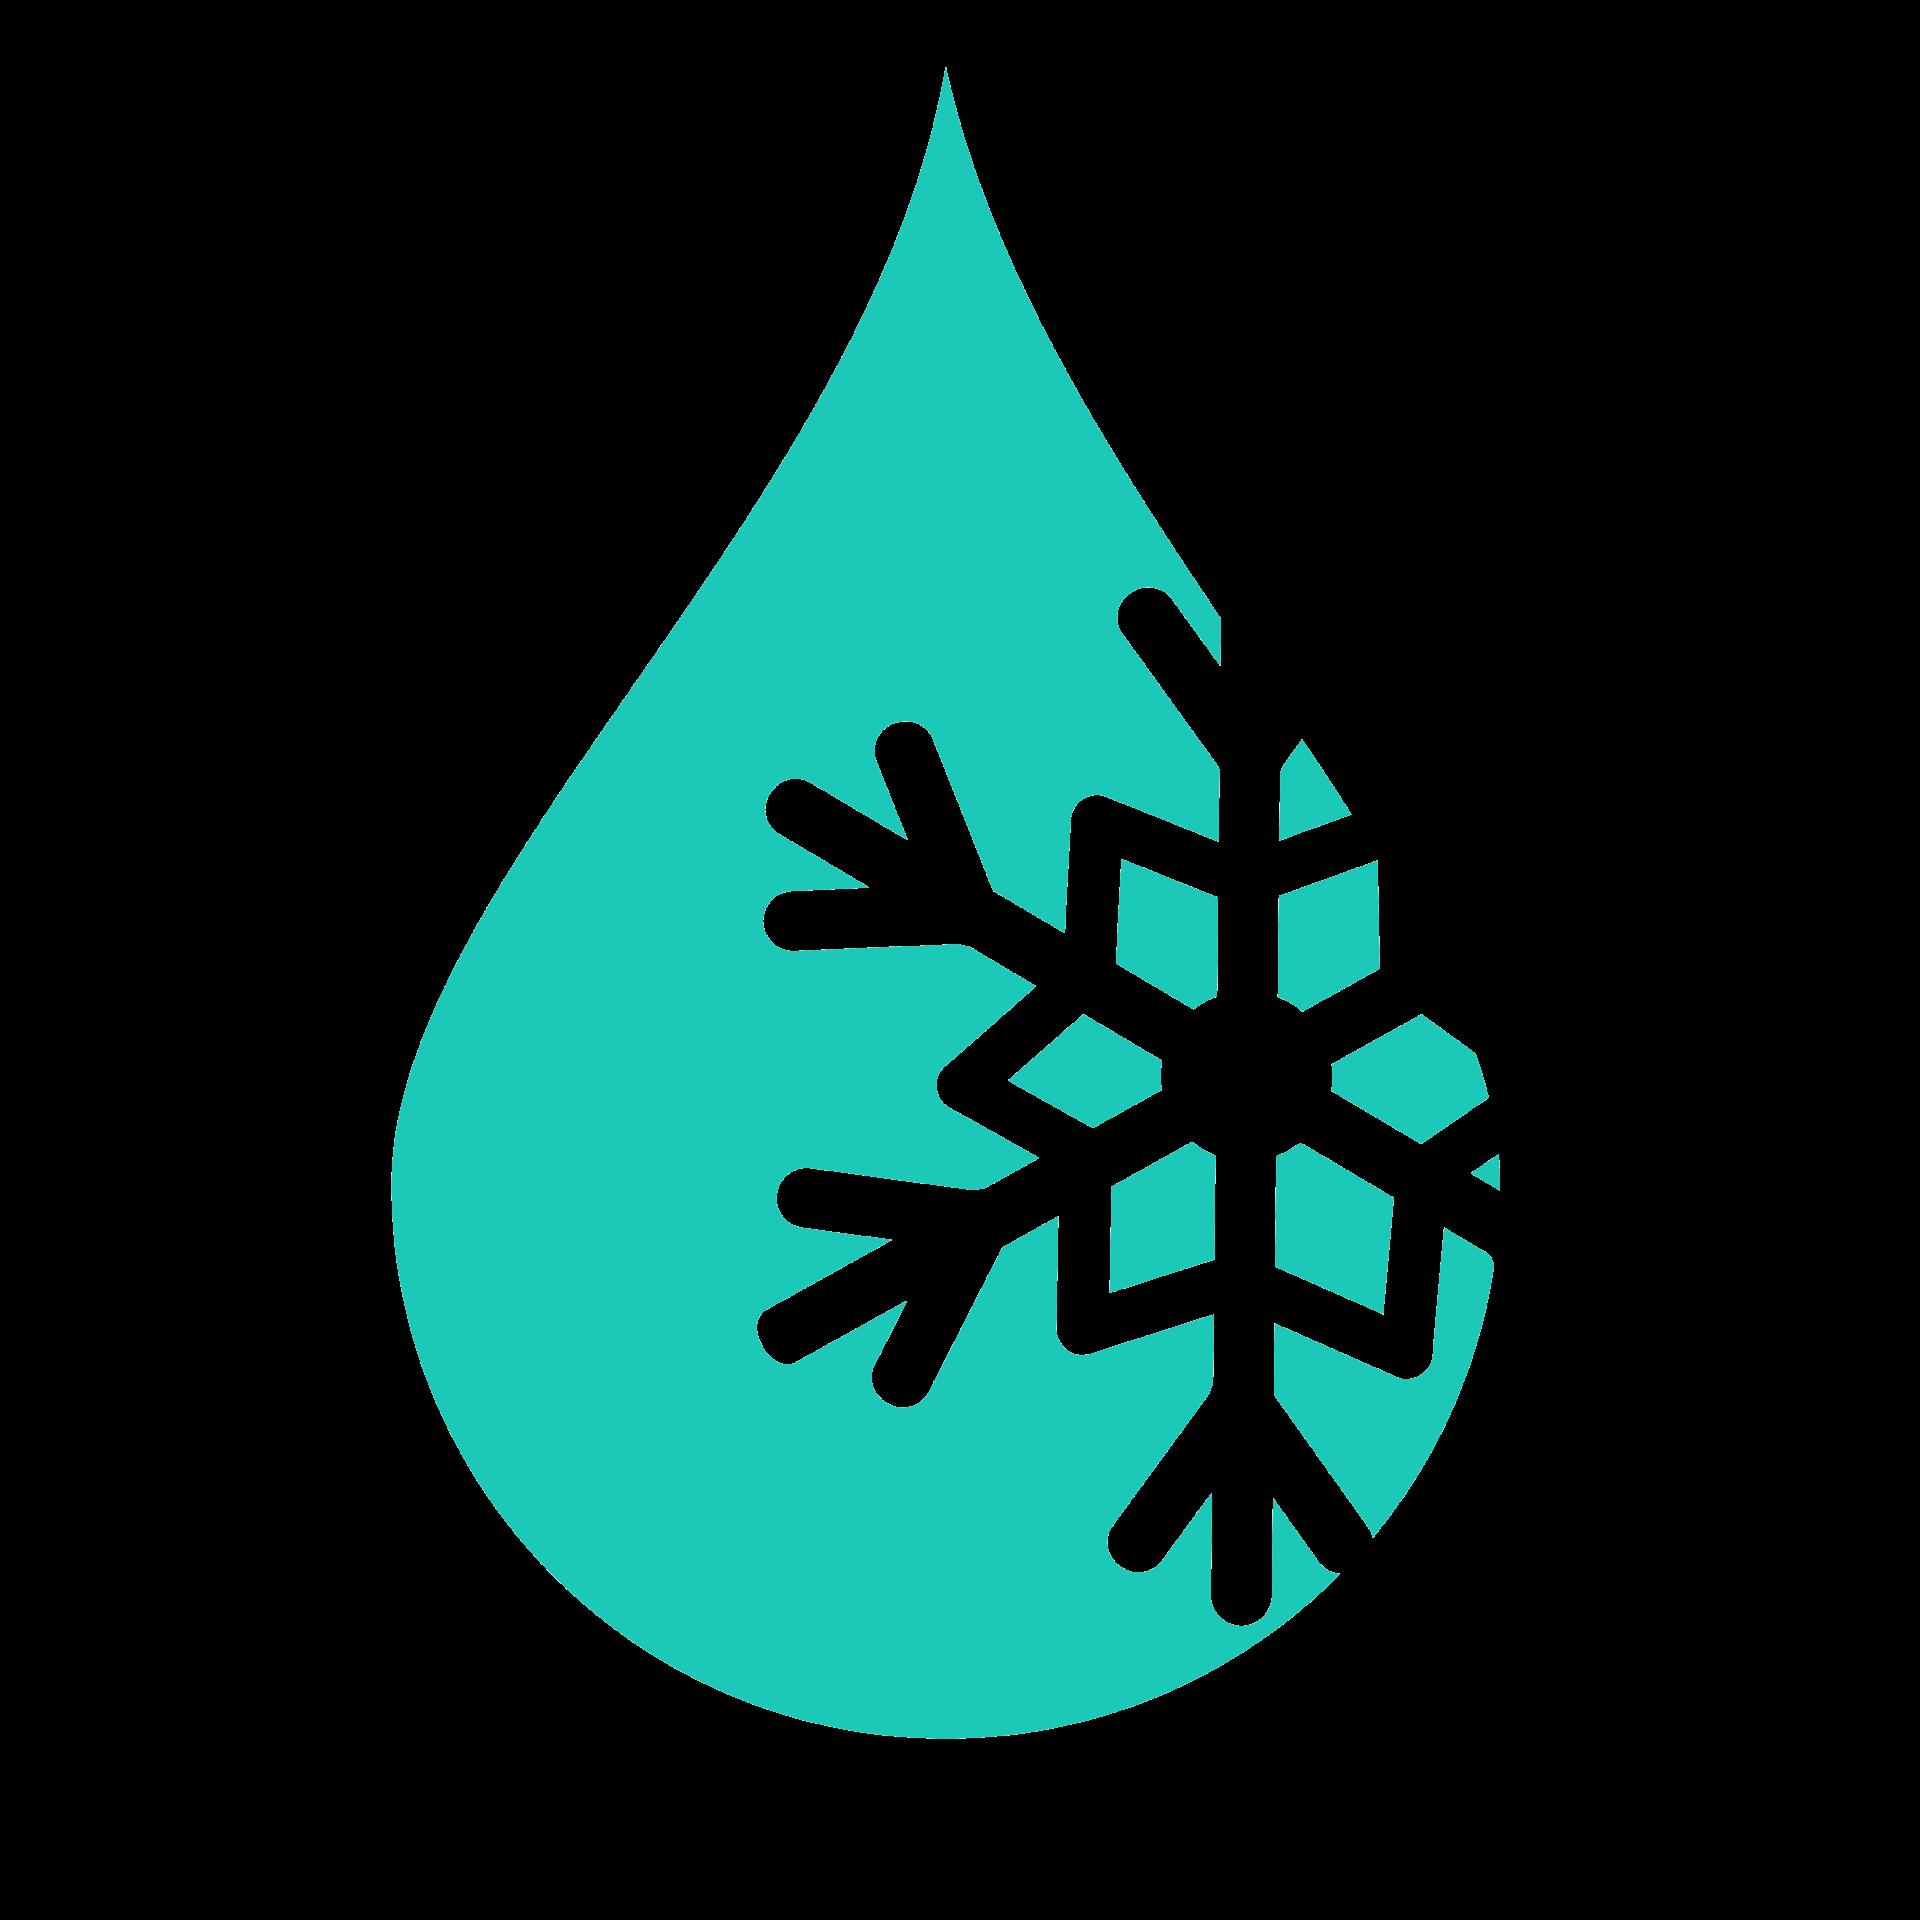 SnowLake Marketing Design